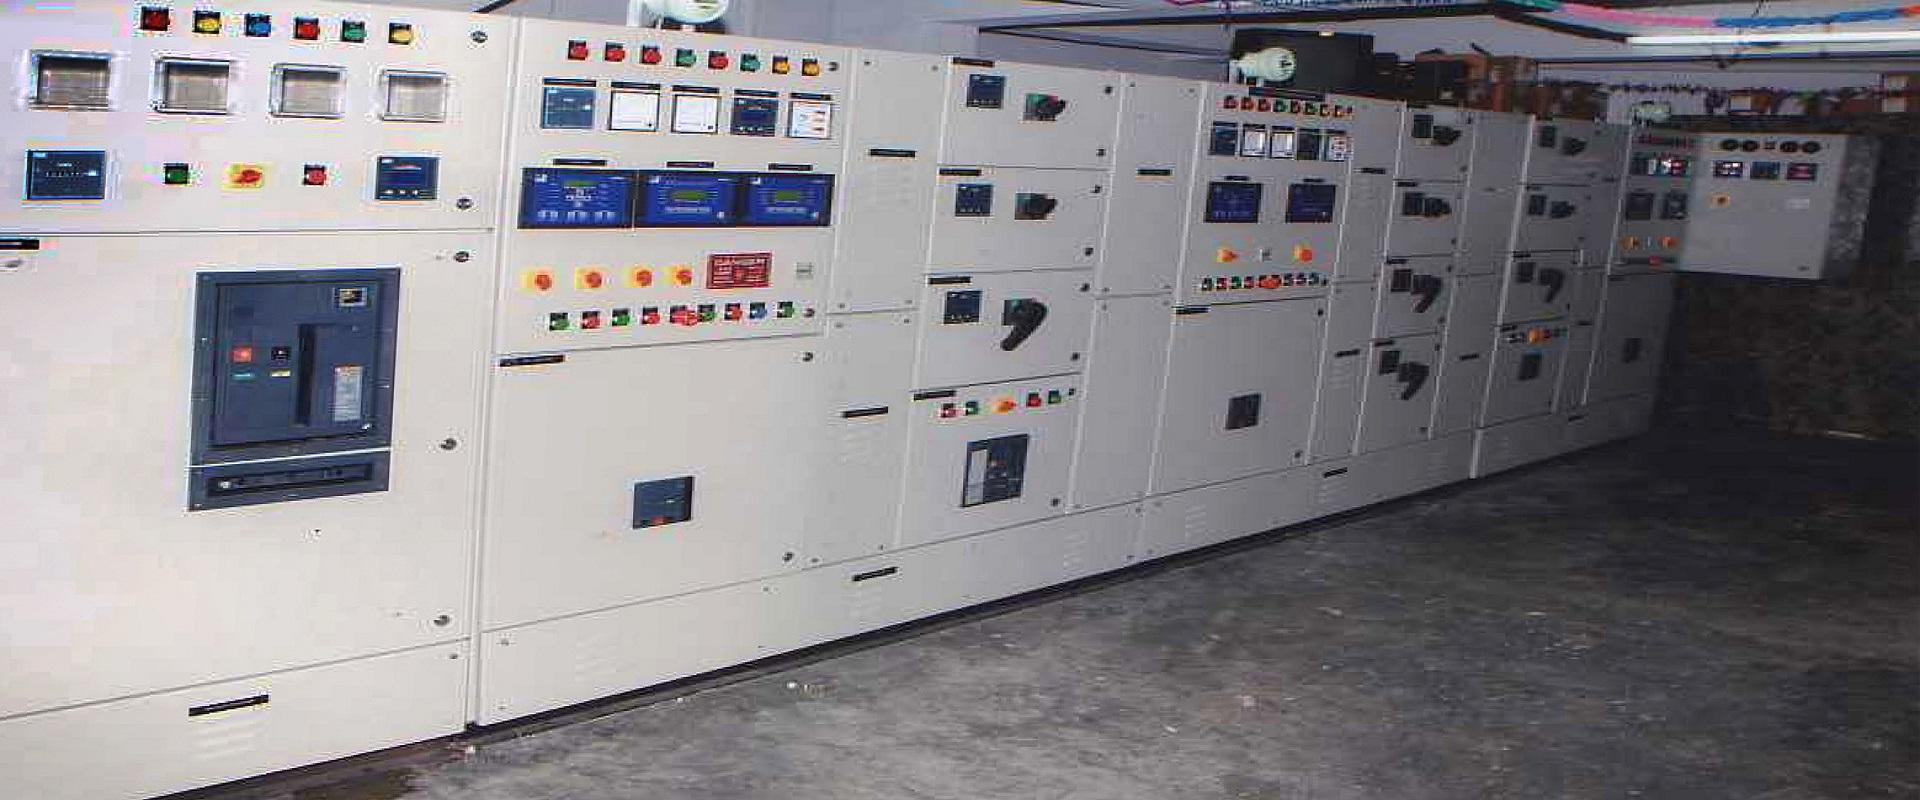 MCC   PCC   PLC PANELS   BUS DUCTS   AMF   ATS Panels Manufacturers ...